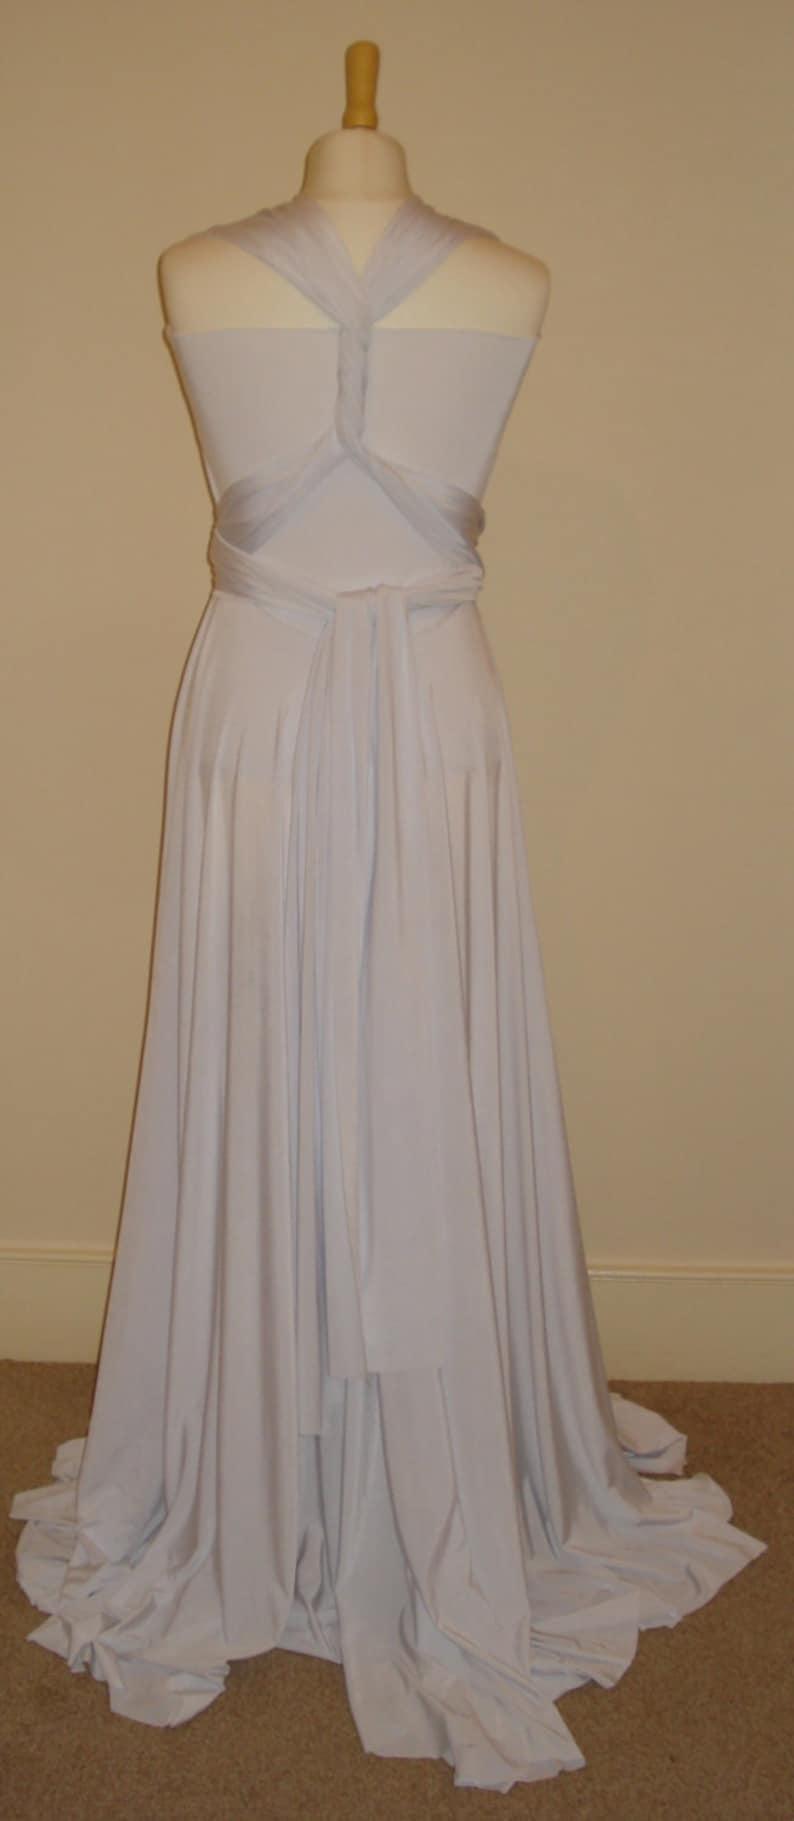 White infinity dress bridesmaid dress floor length wedding dress twist wrap dress white cocktail dress formal evening prom party dress gown